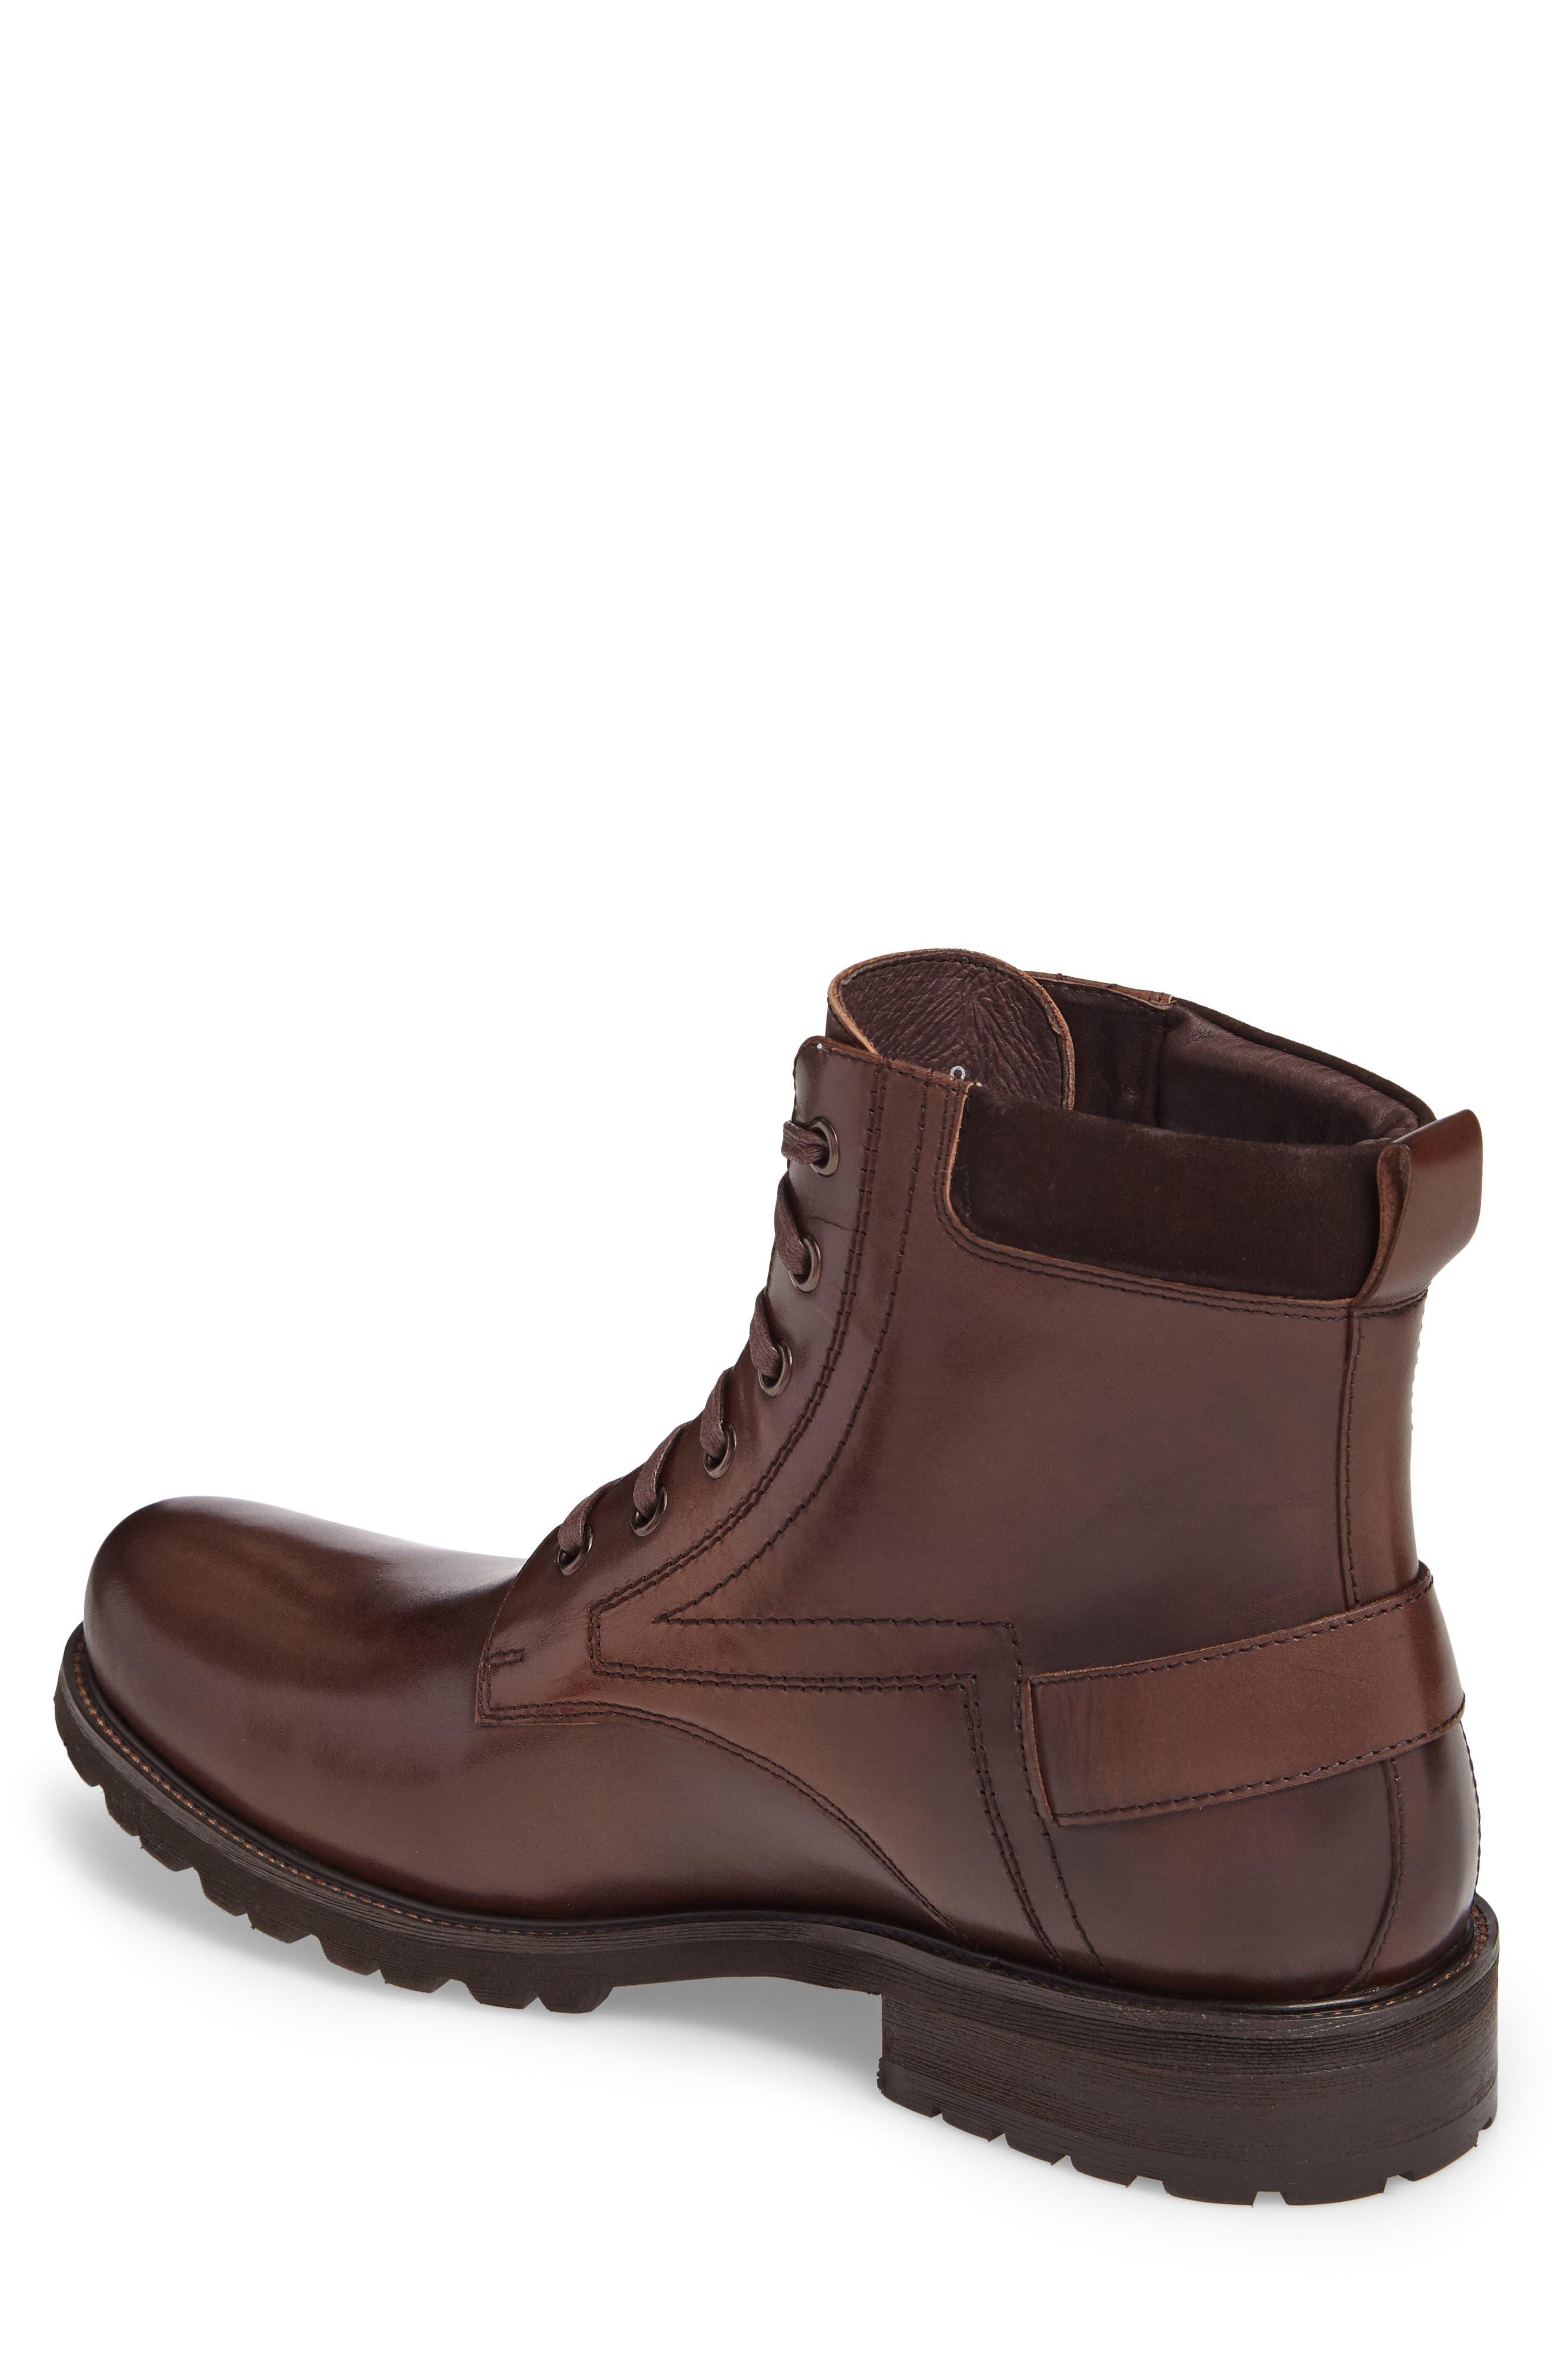 Keller Plain Toe Boot,                             Alternate thumbnail 2, color,                             Brown Leather